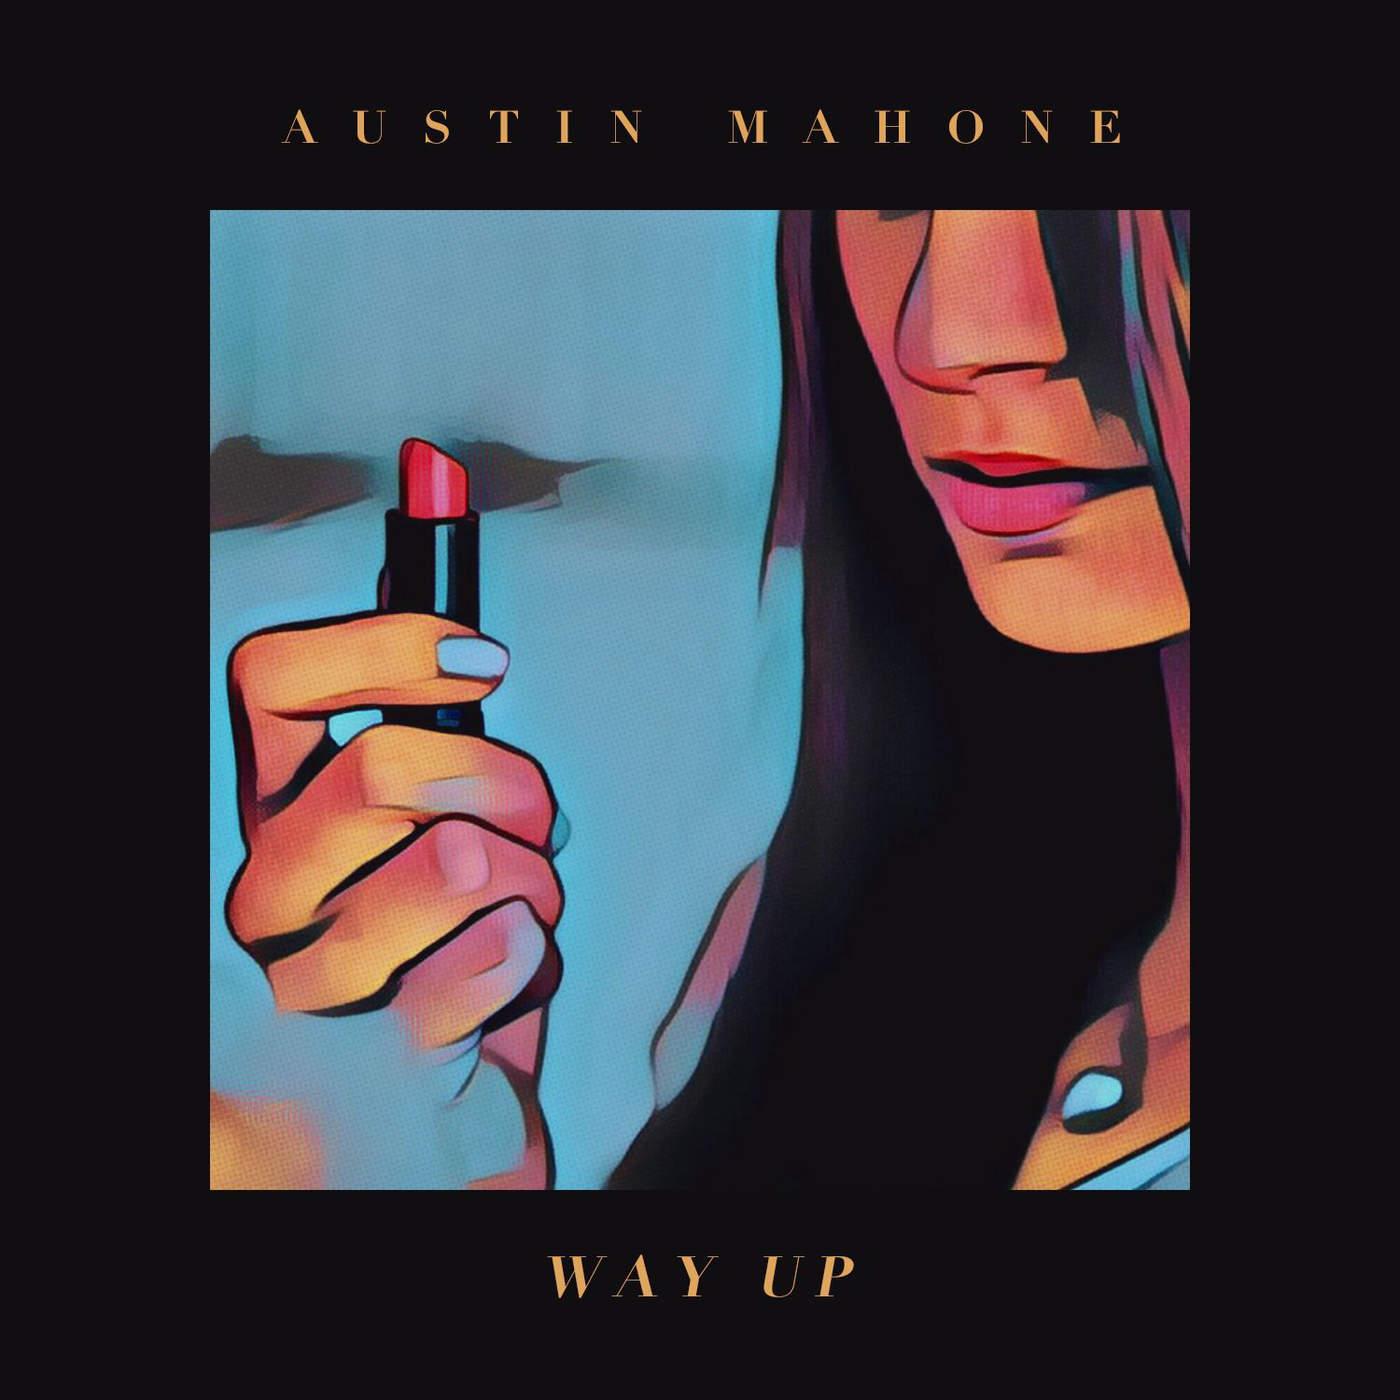 Austin Mahone - Way Up Cover